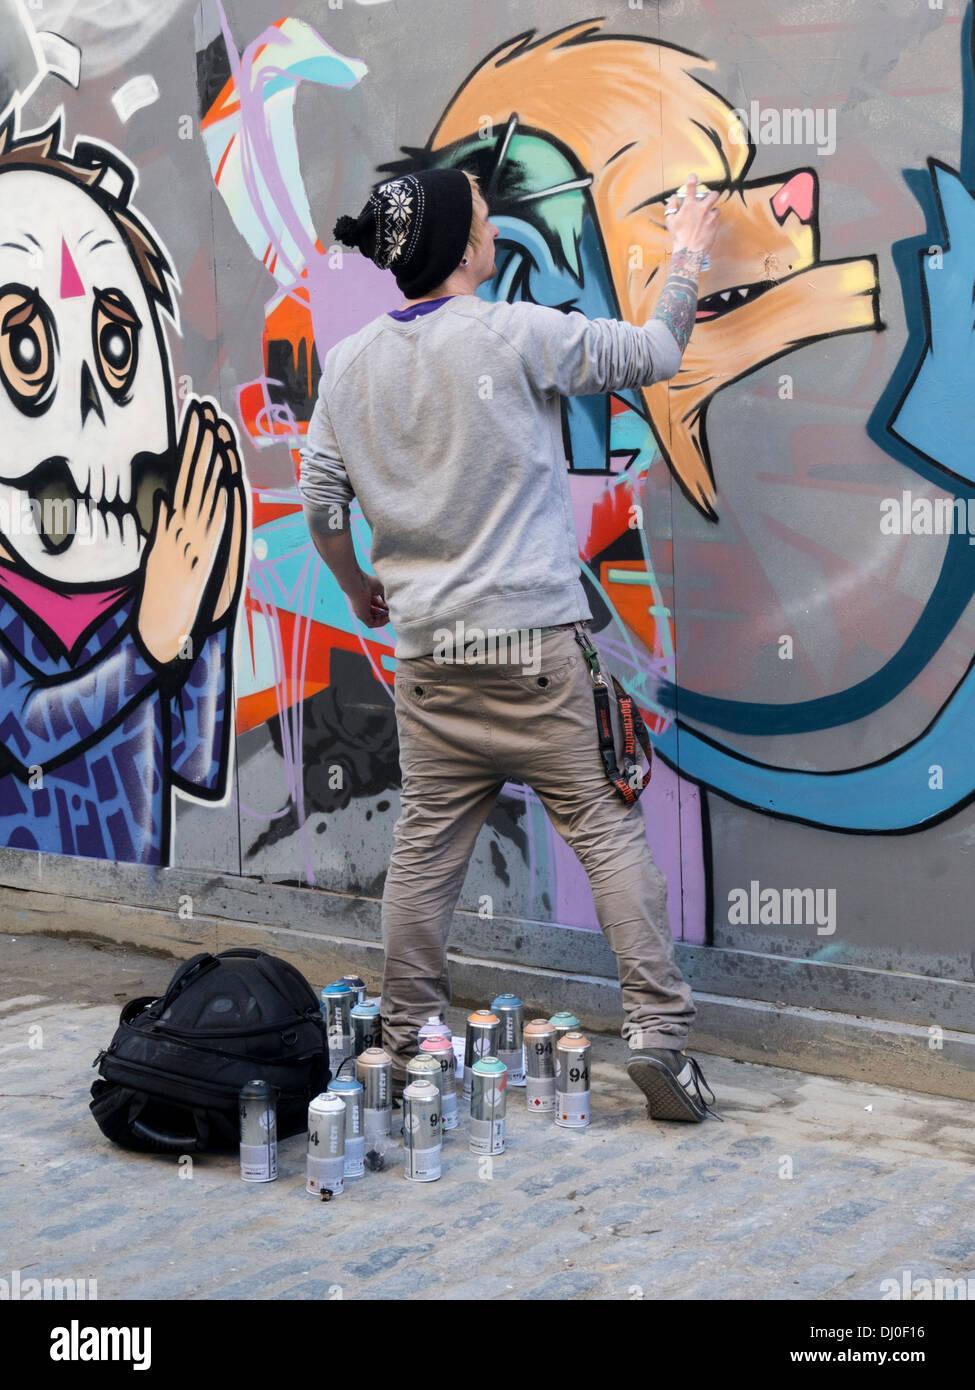 Graffiti artist at work in Brick Lane, east London - Stock Image